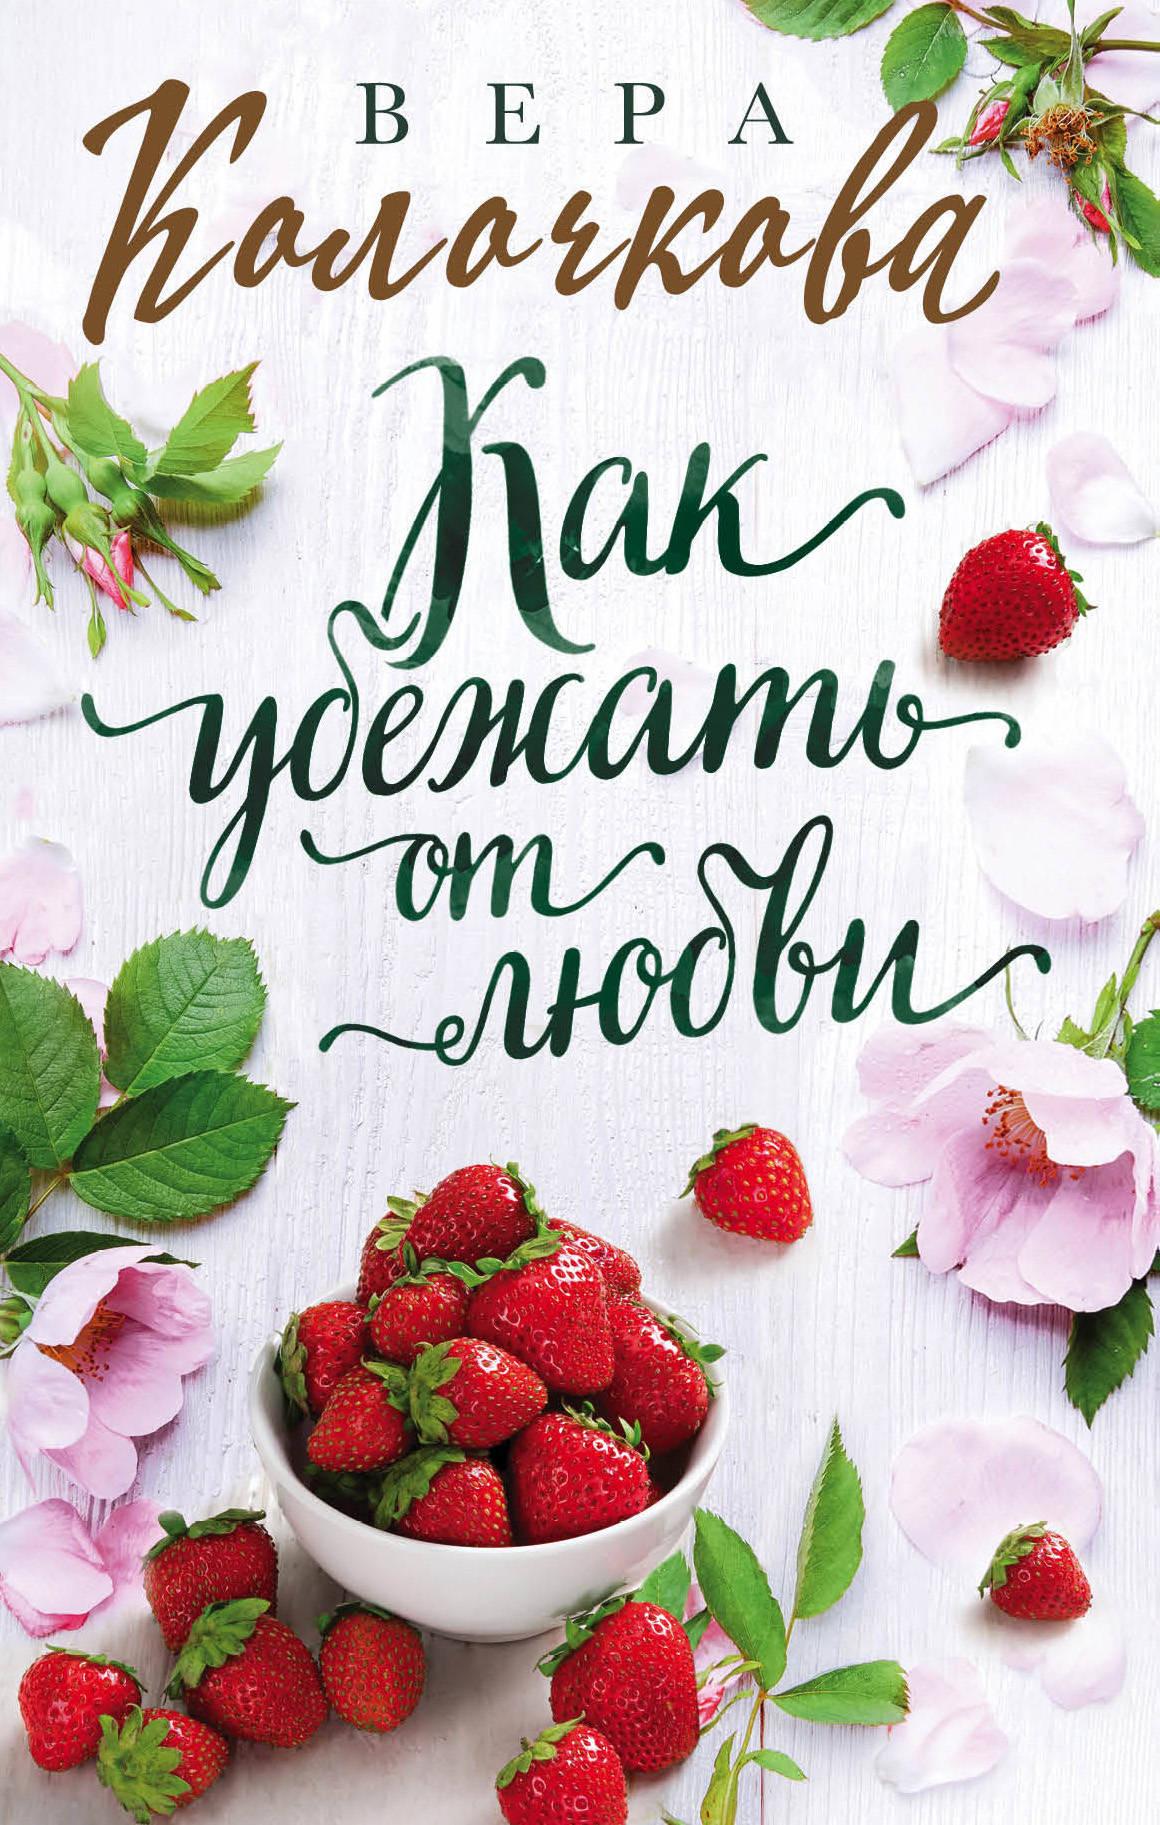 Как убежать от любви | Колочкова Вера Александровна